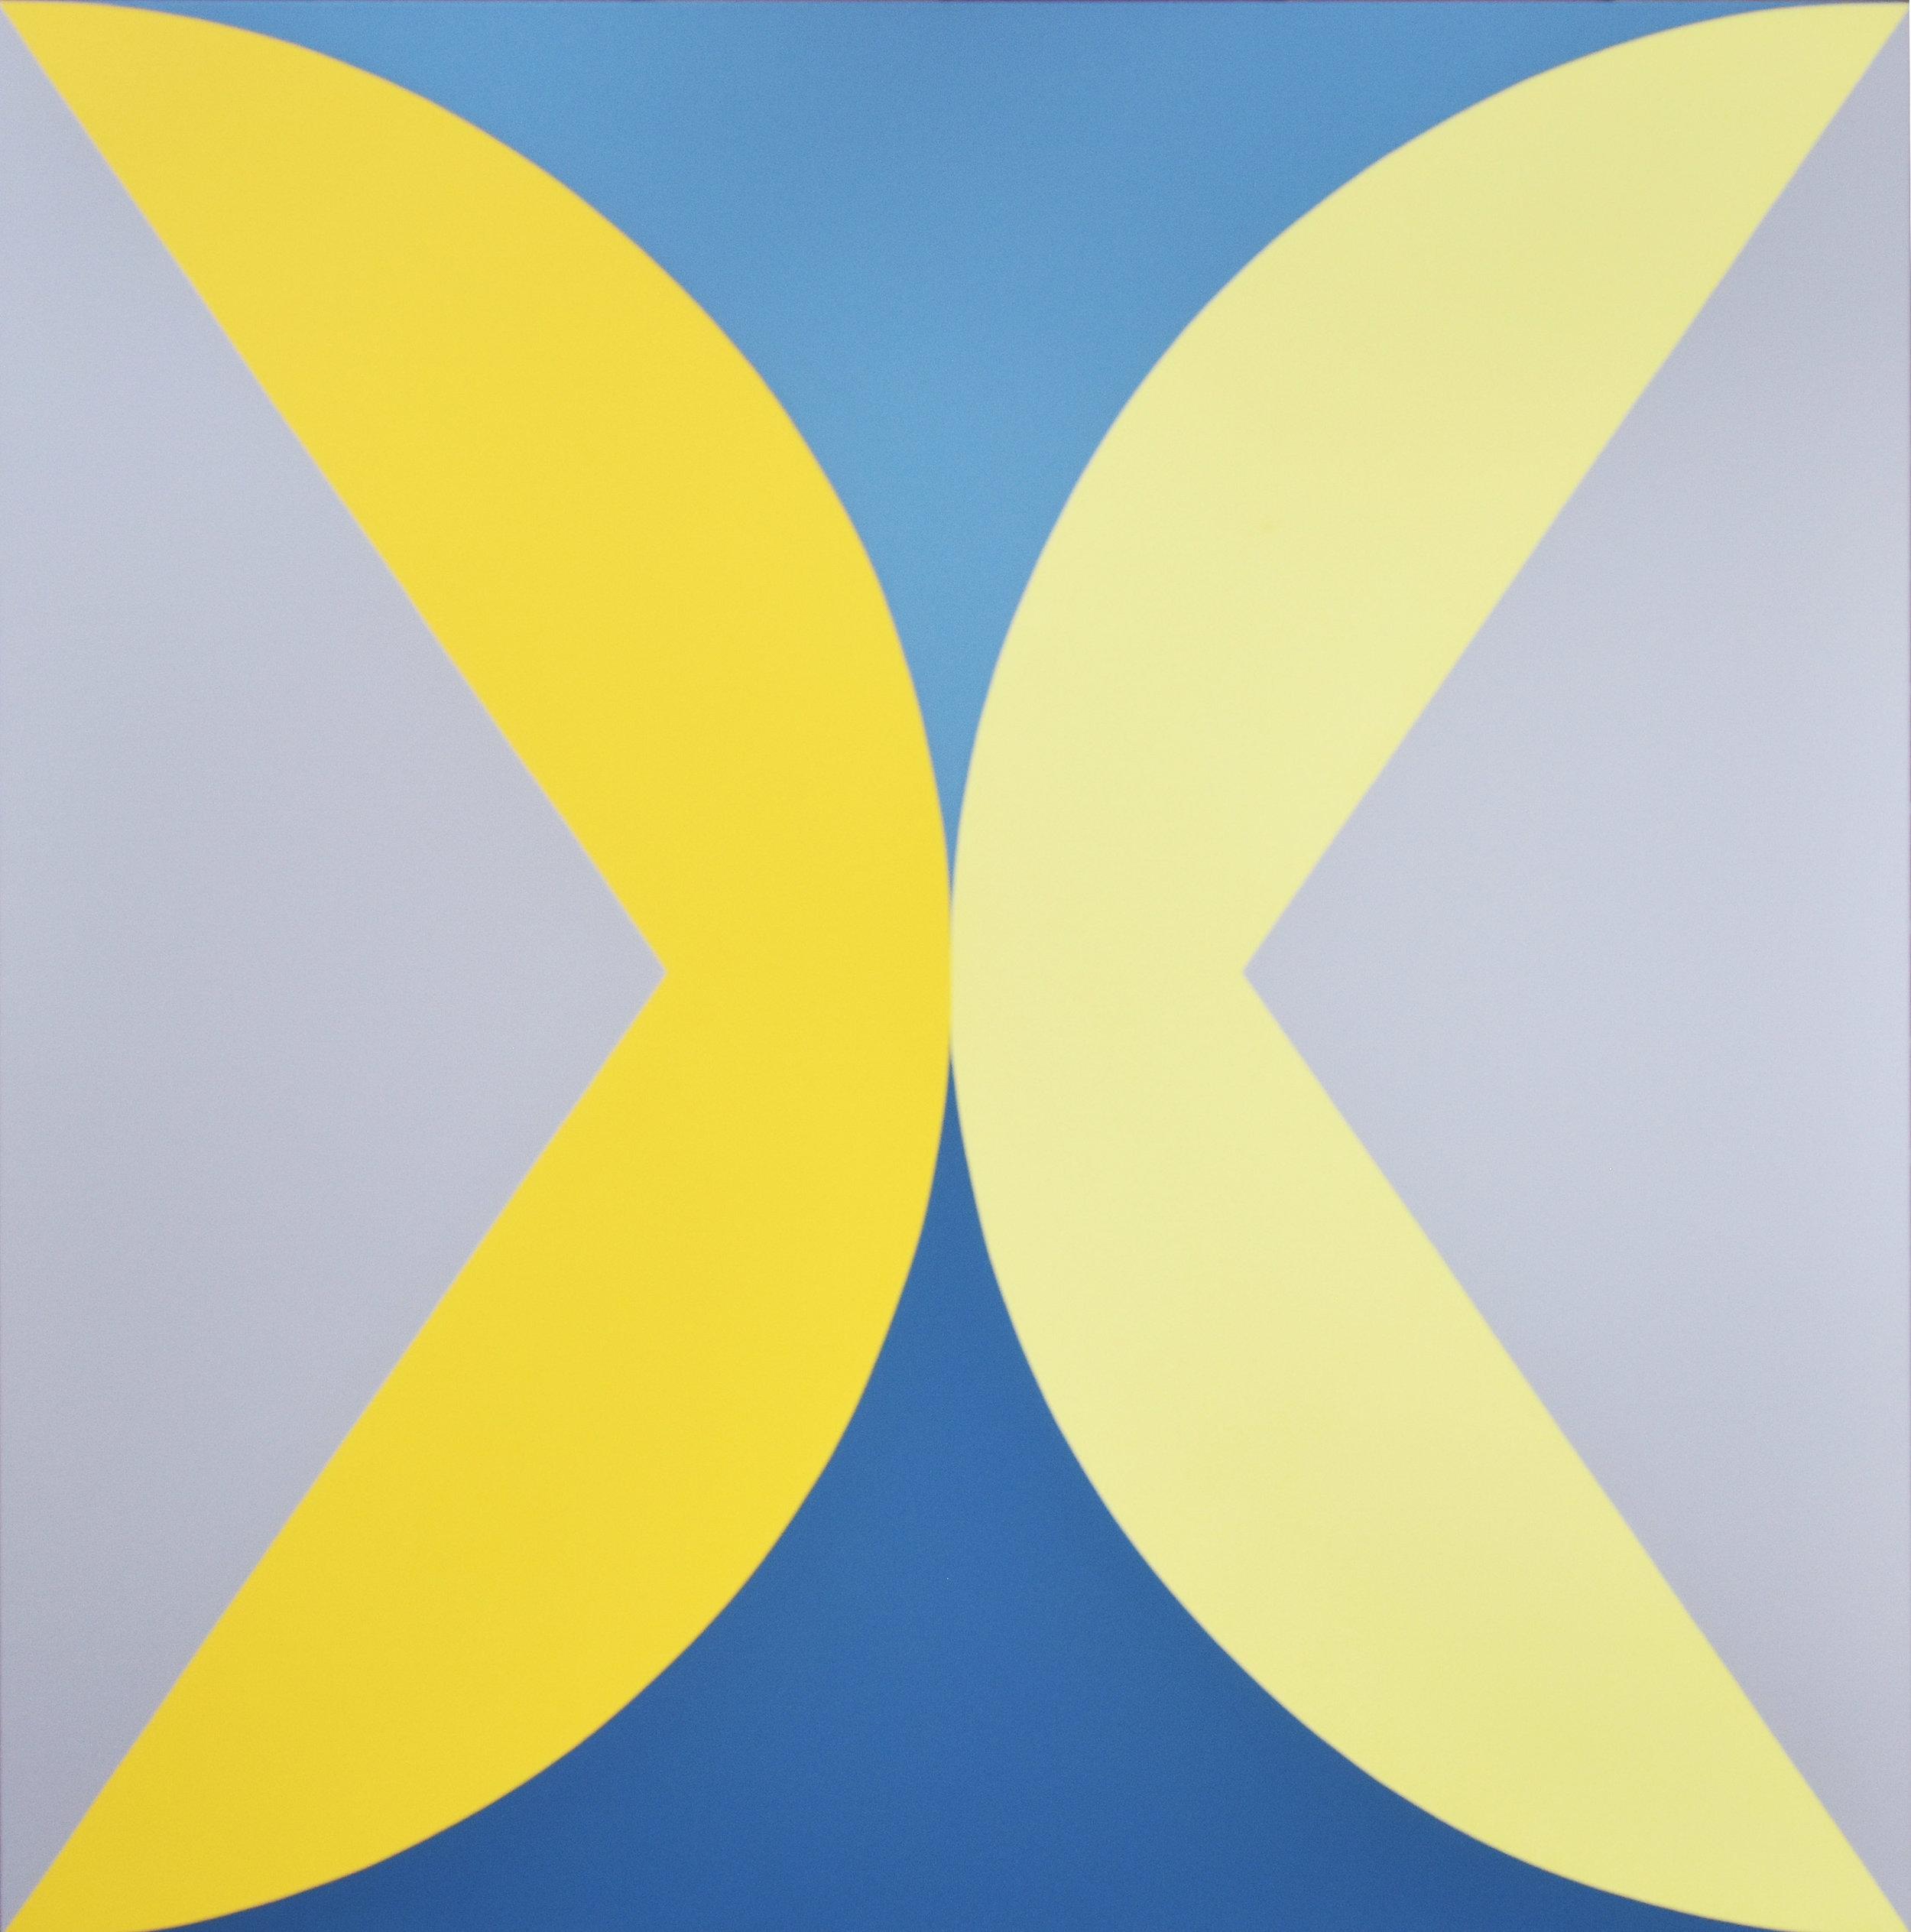 Untitled 1. 2018. Acrylic on canvas. 137 x 137 cm $3,700